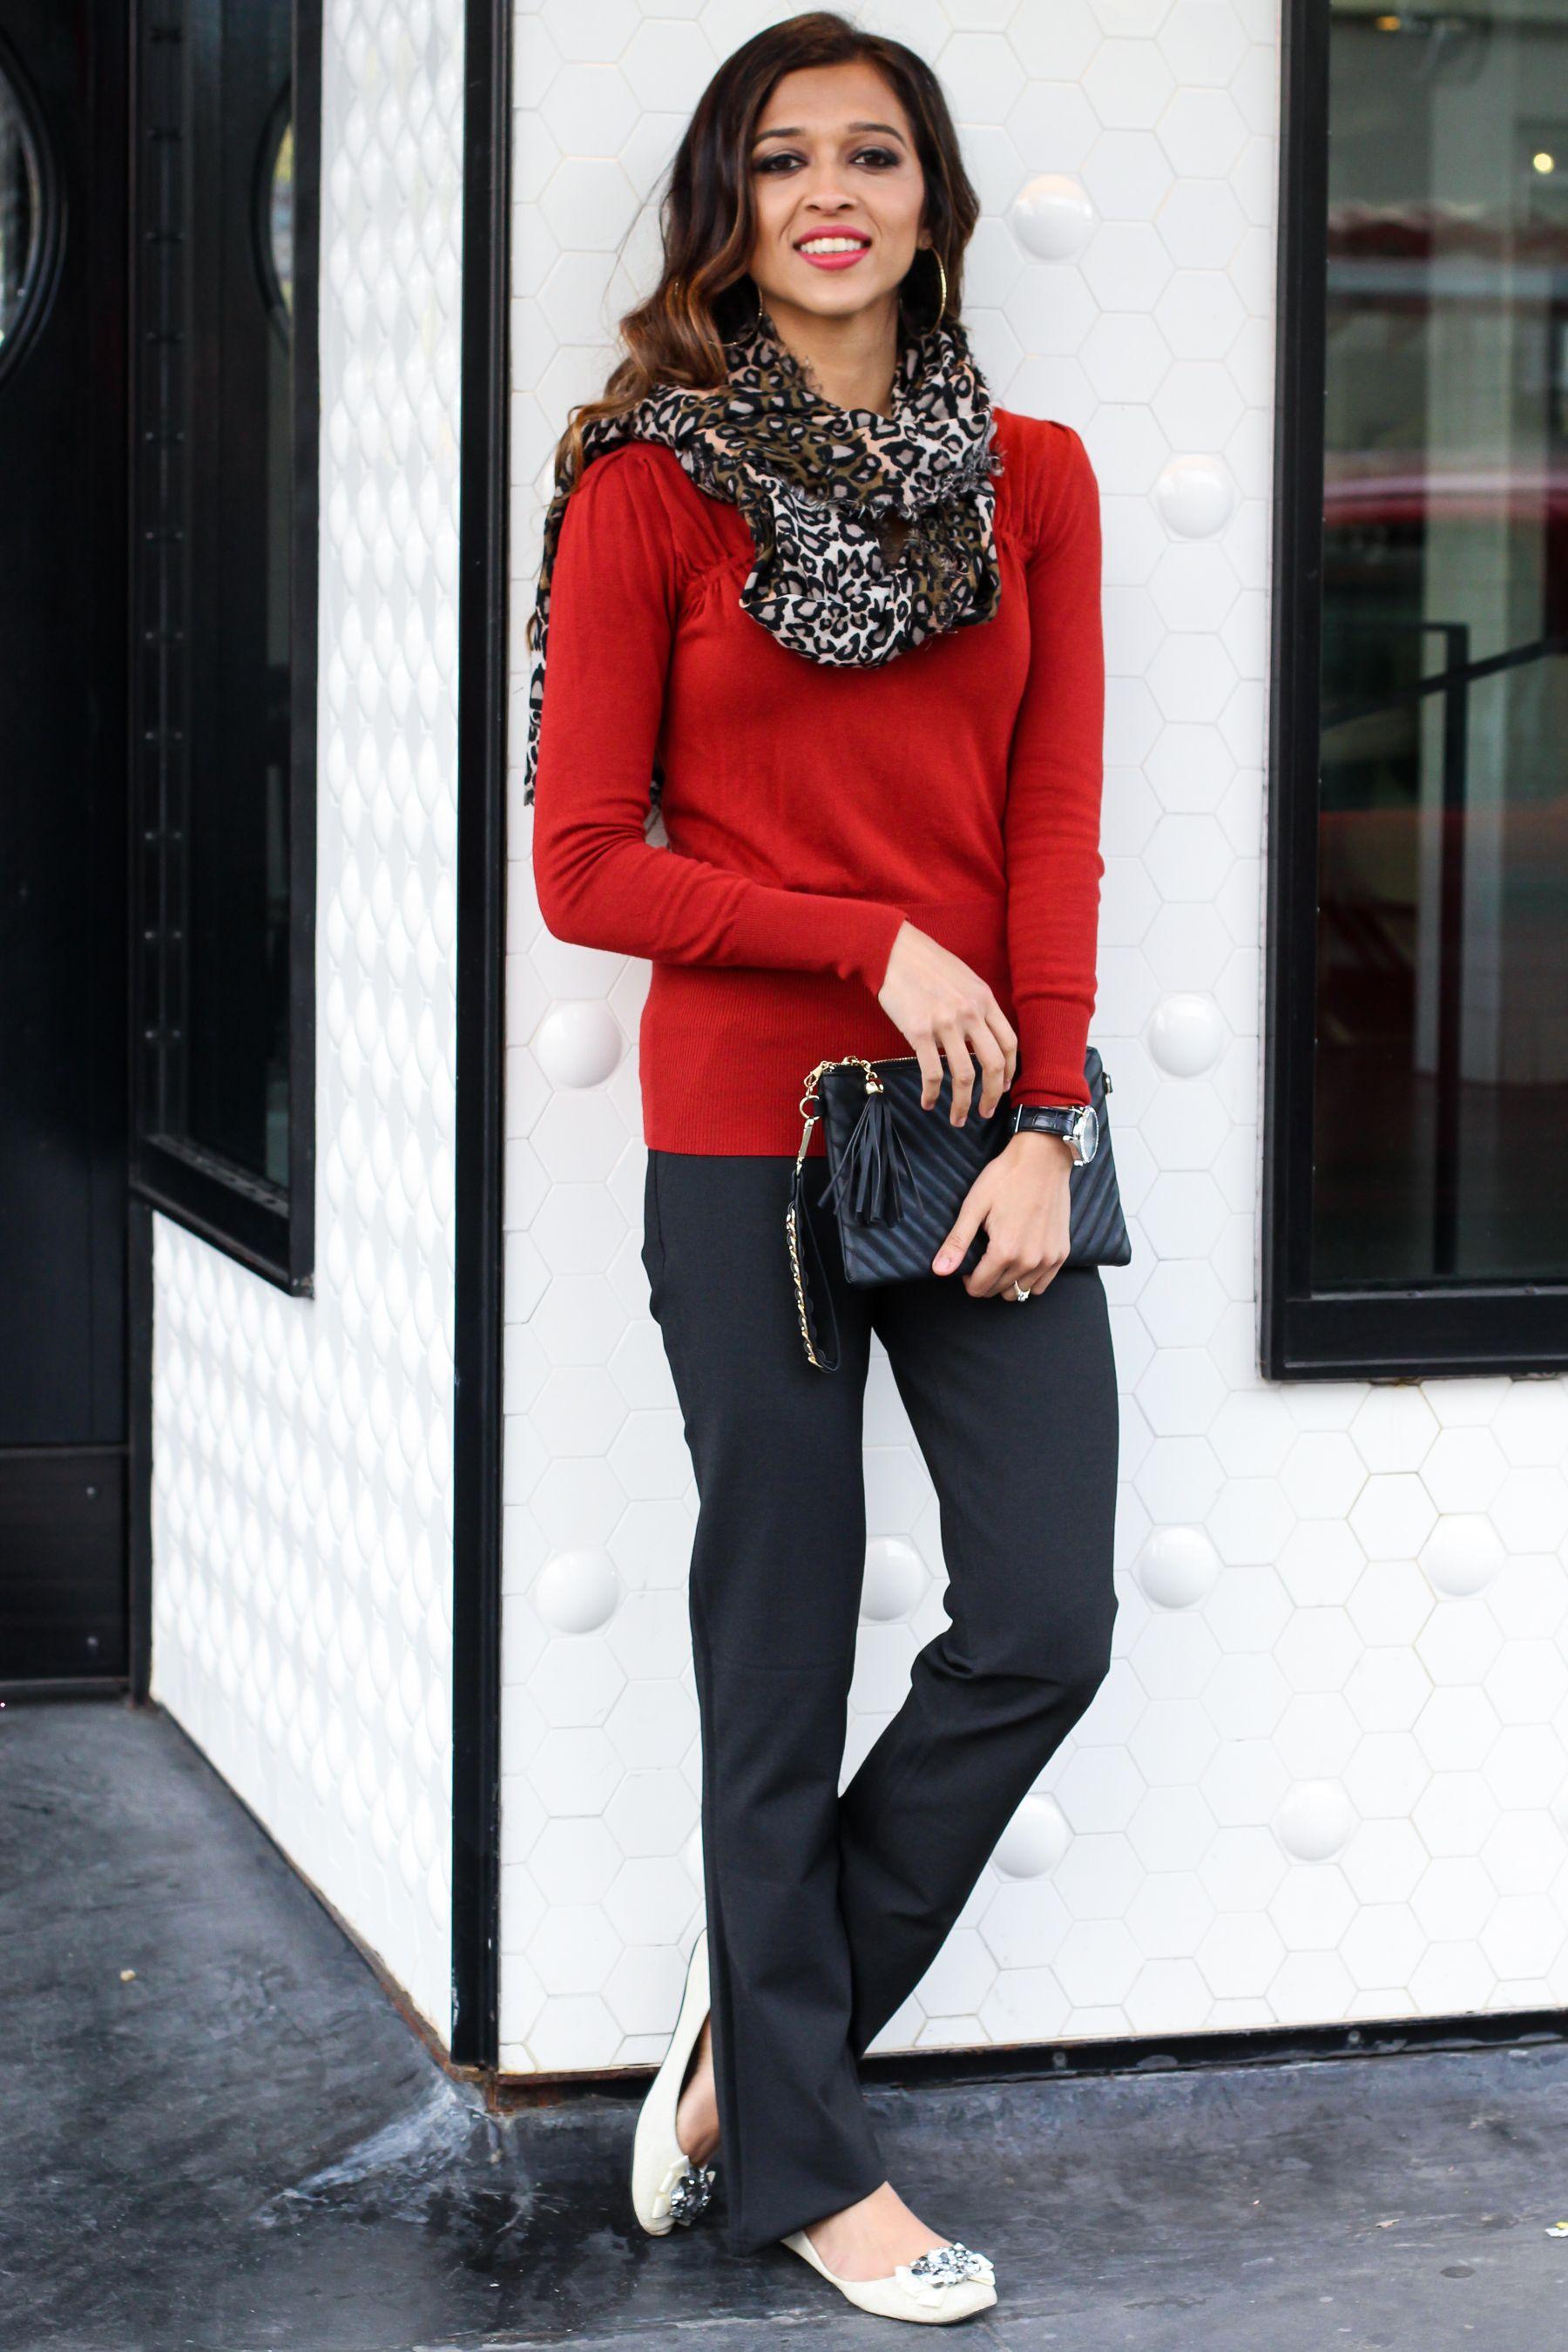 8612155e55105 Dress Pants Yoga Pants  Dress It Up or Dress It Down by Blogger ...